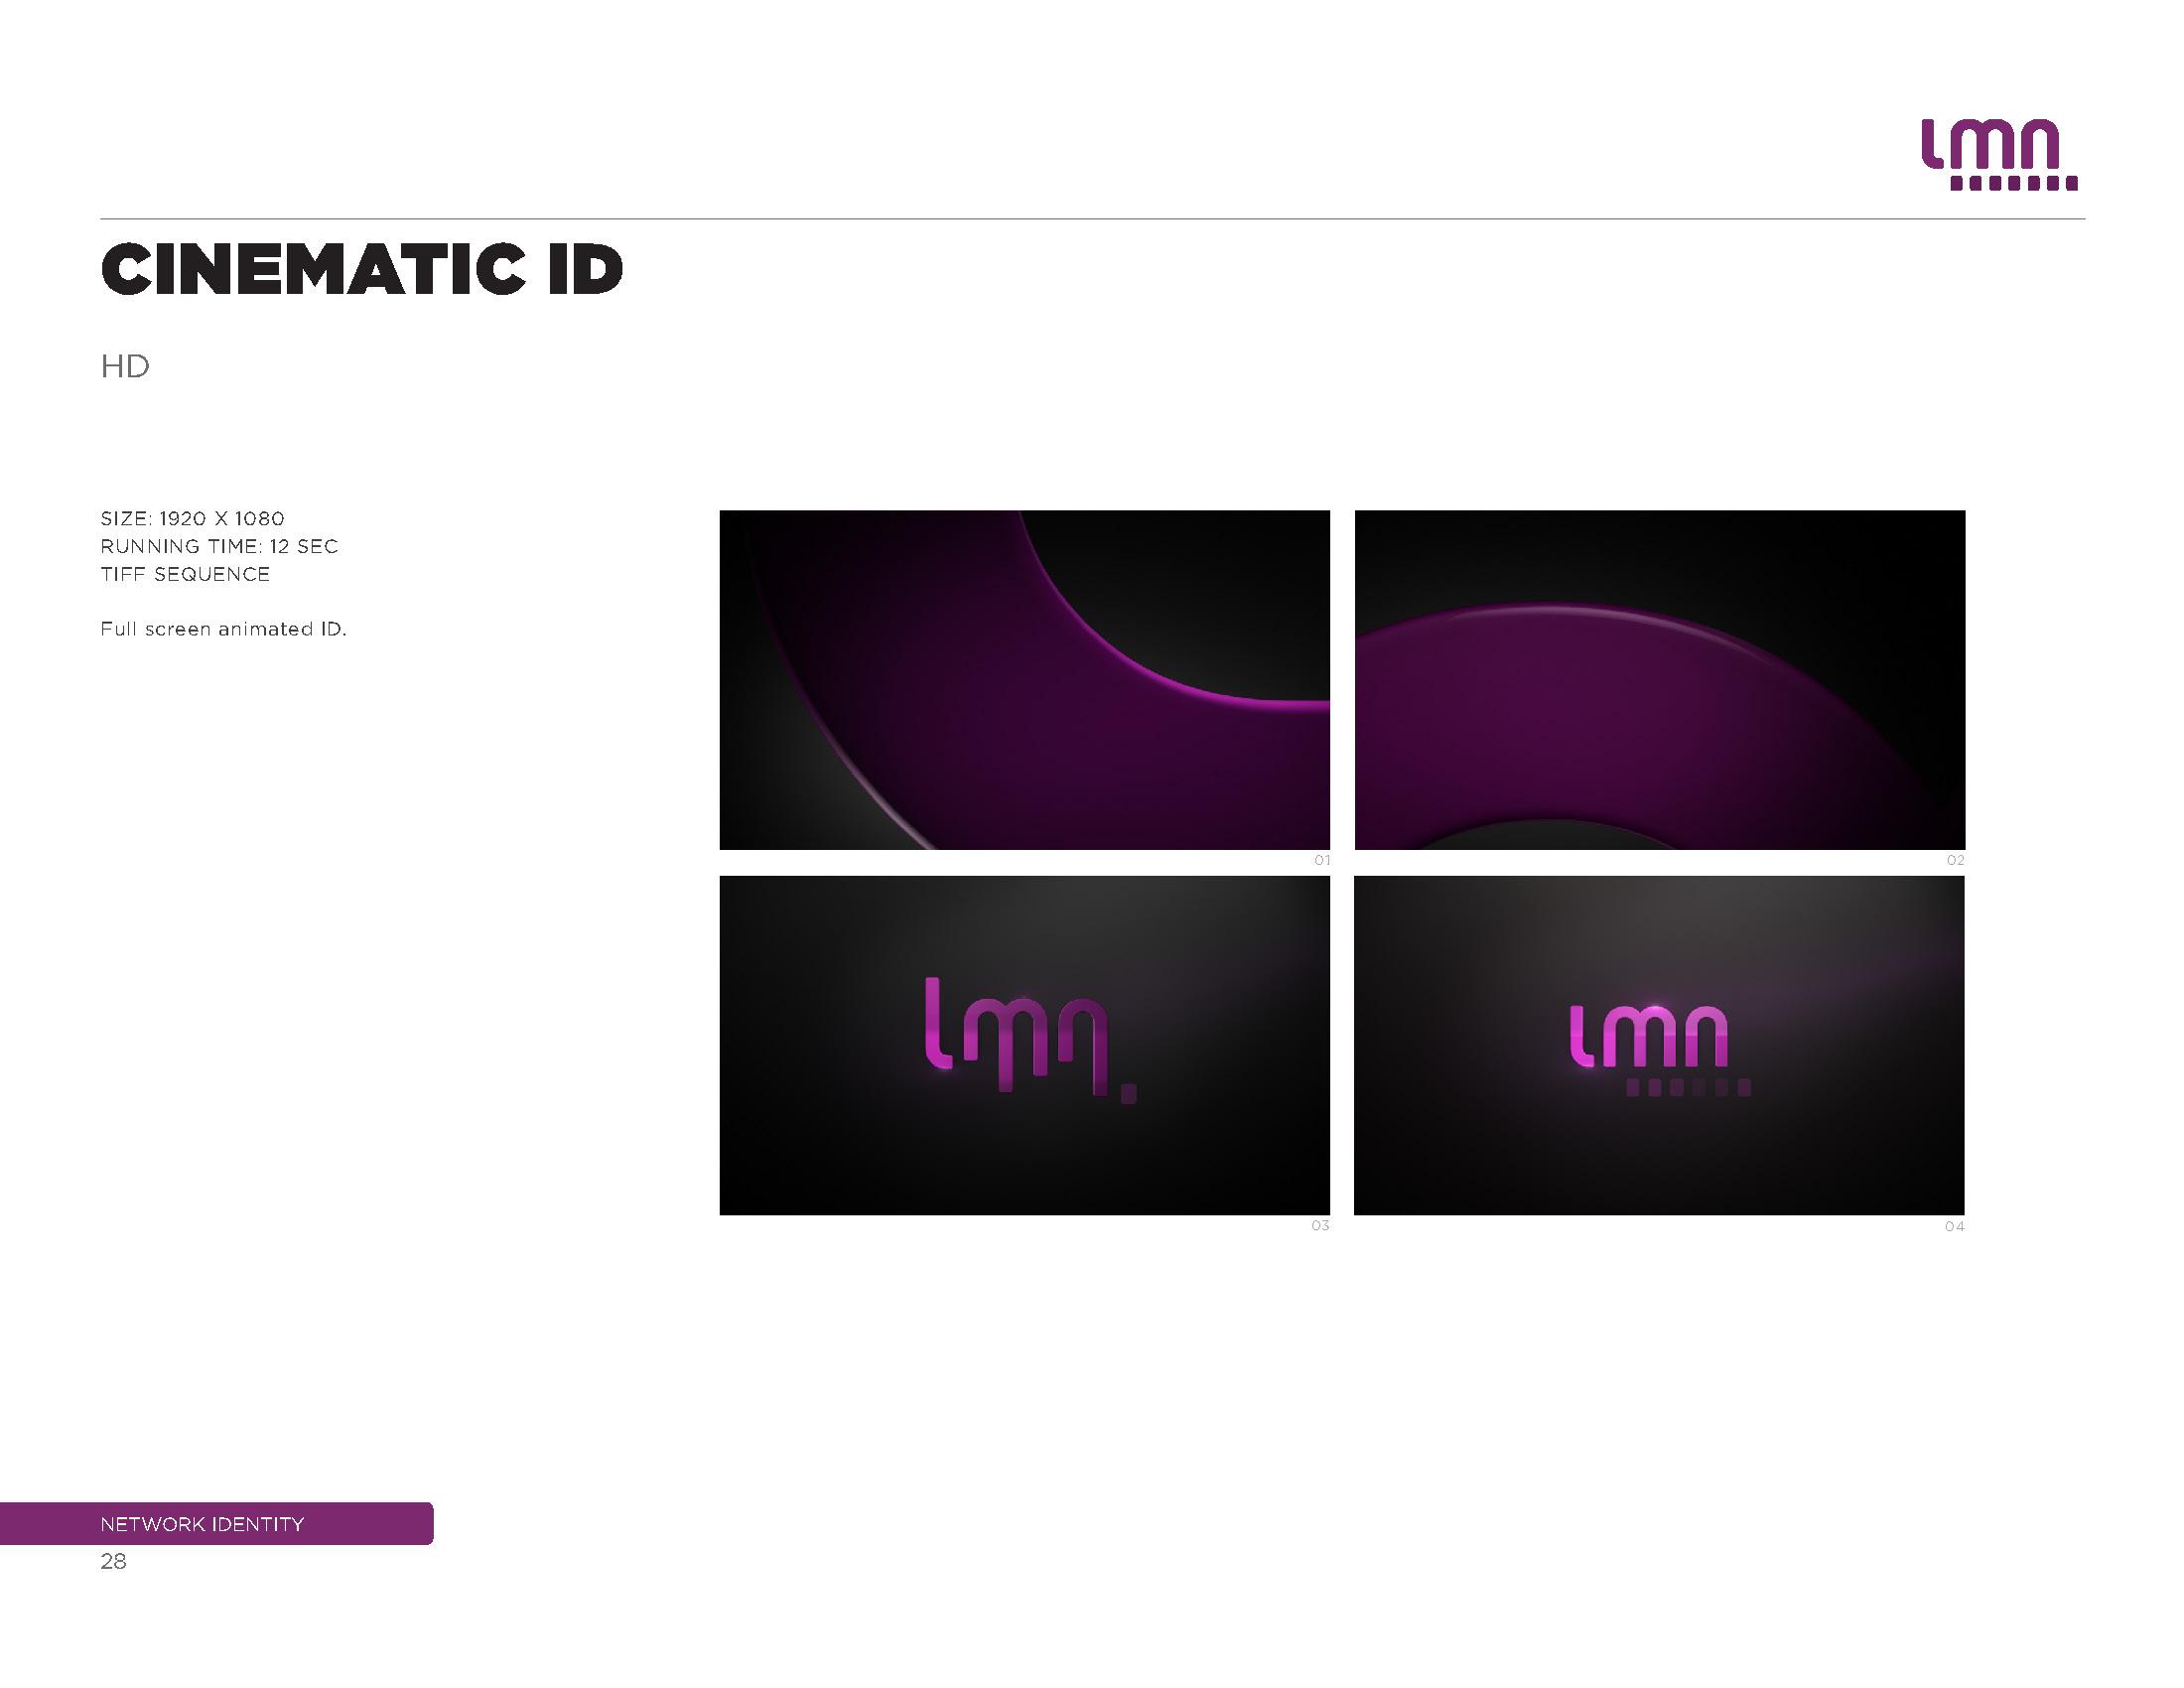 LMN_styleguide_092711_HQ_Page_28.jpg